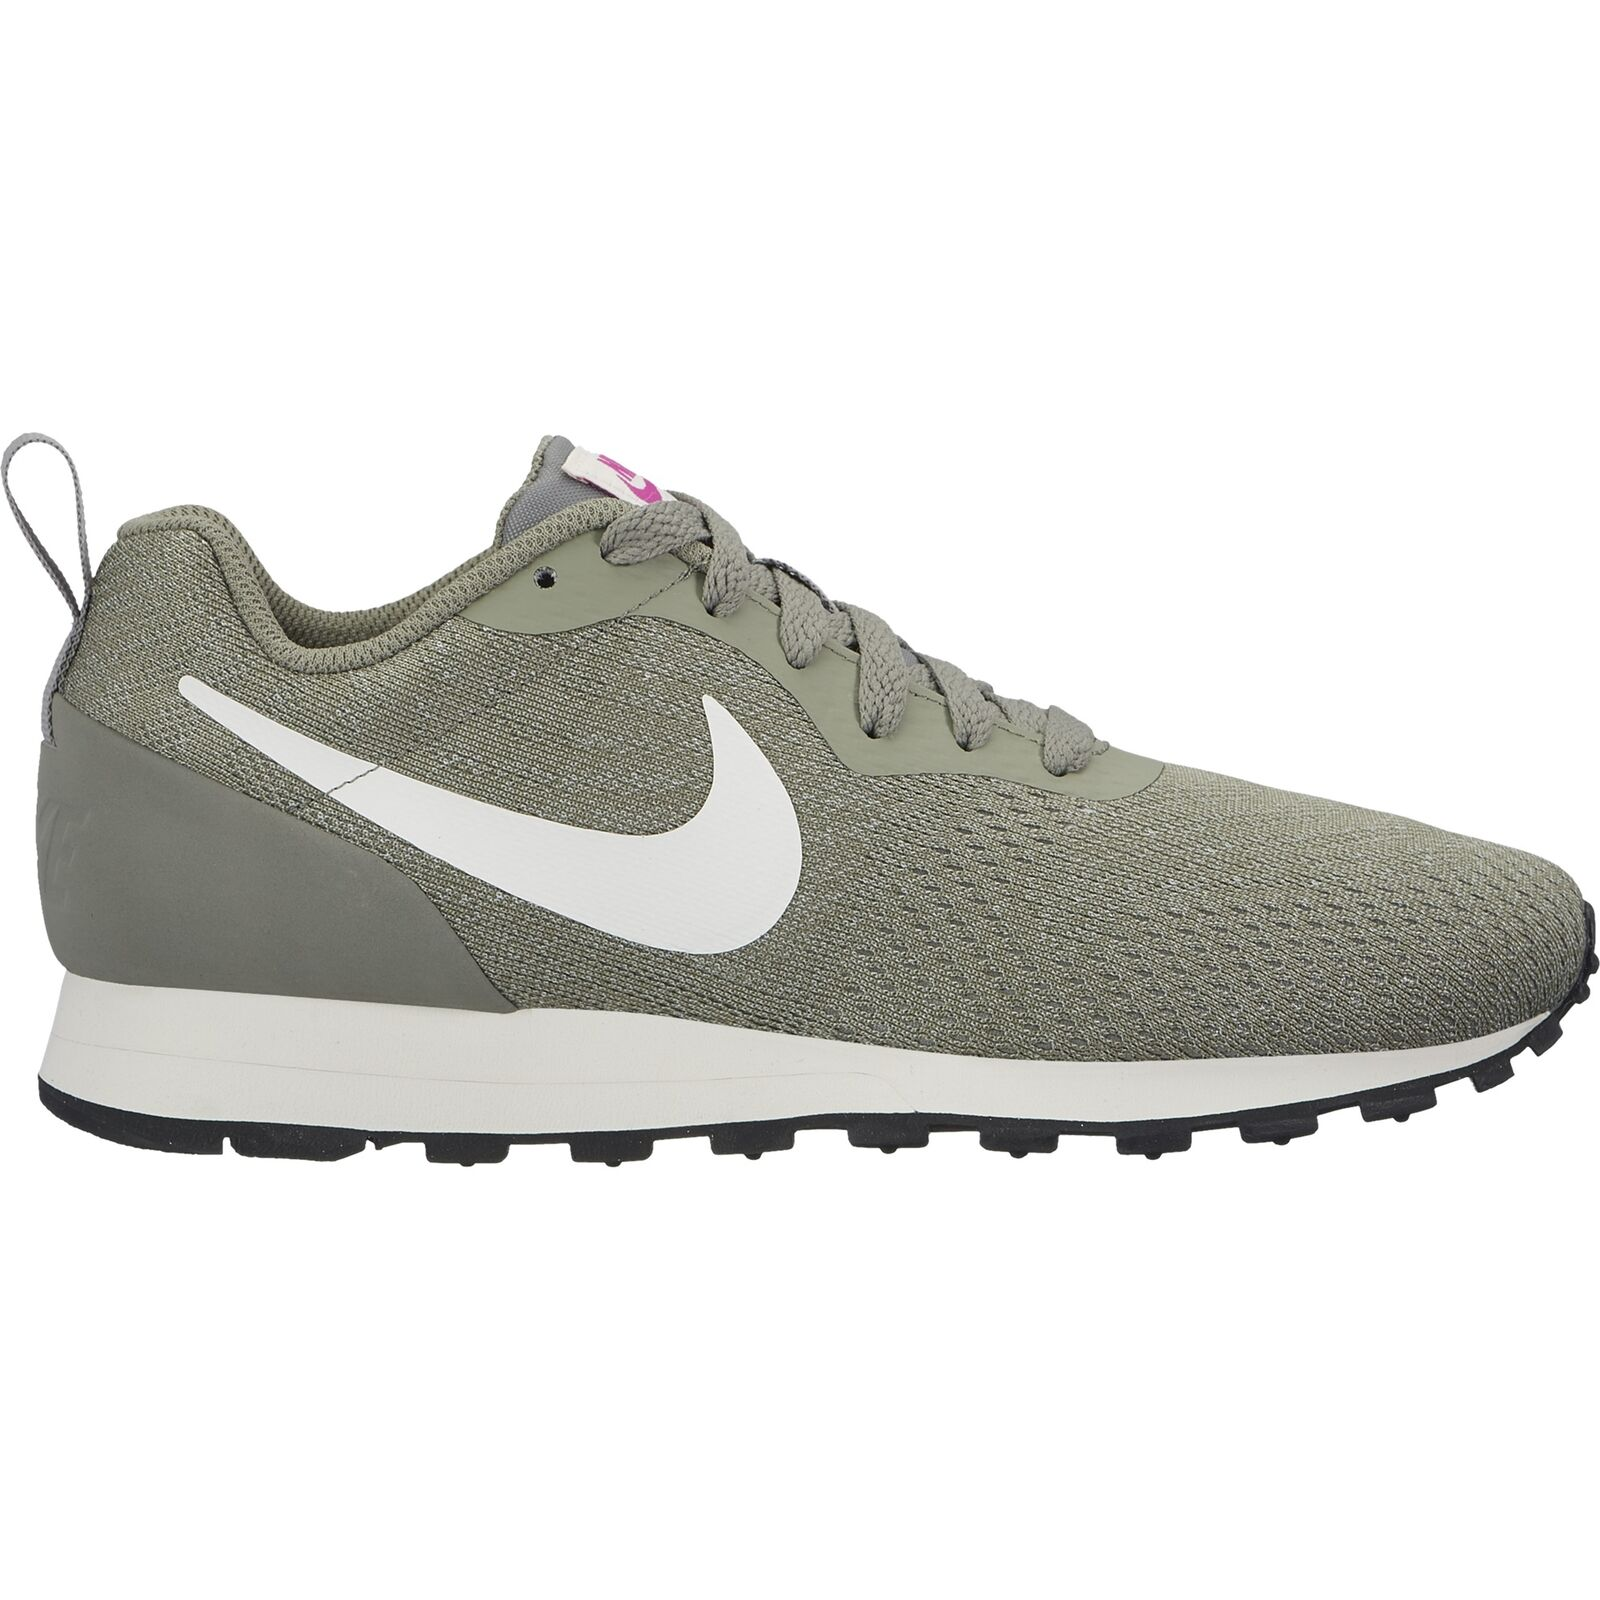 Nike MD Sneakers MD Nike Runner 2 Damen Sportschuhe Freizeitschuhe Turnschuhe 9aa9ec